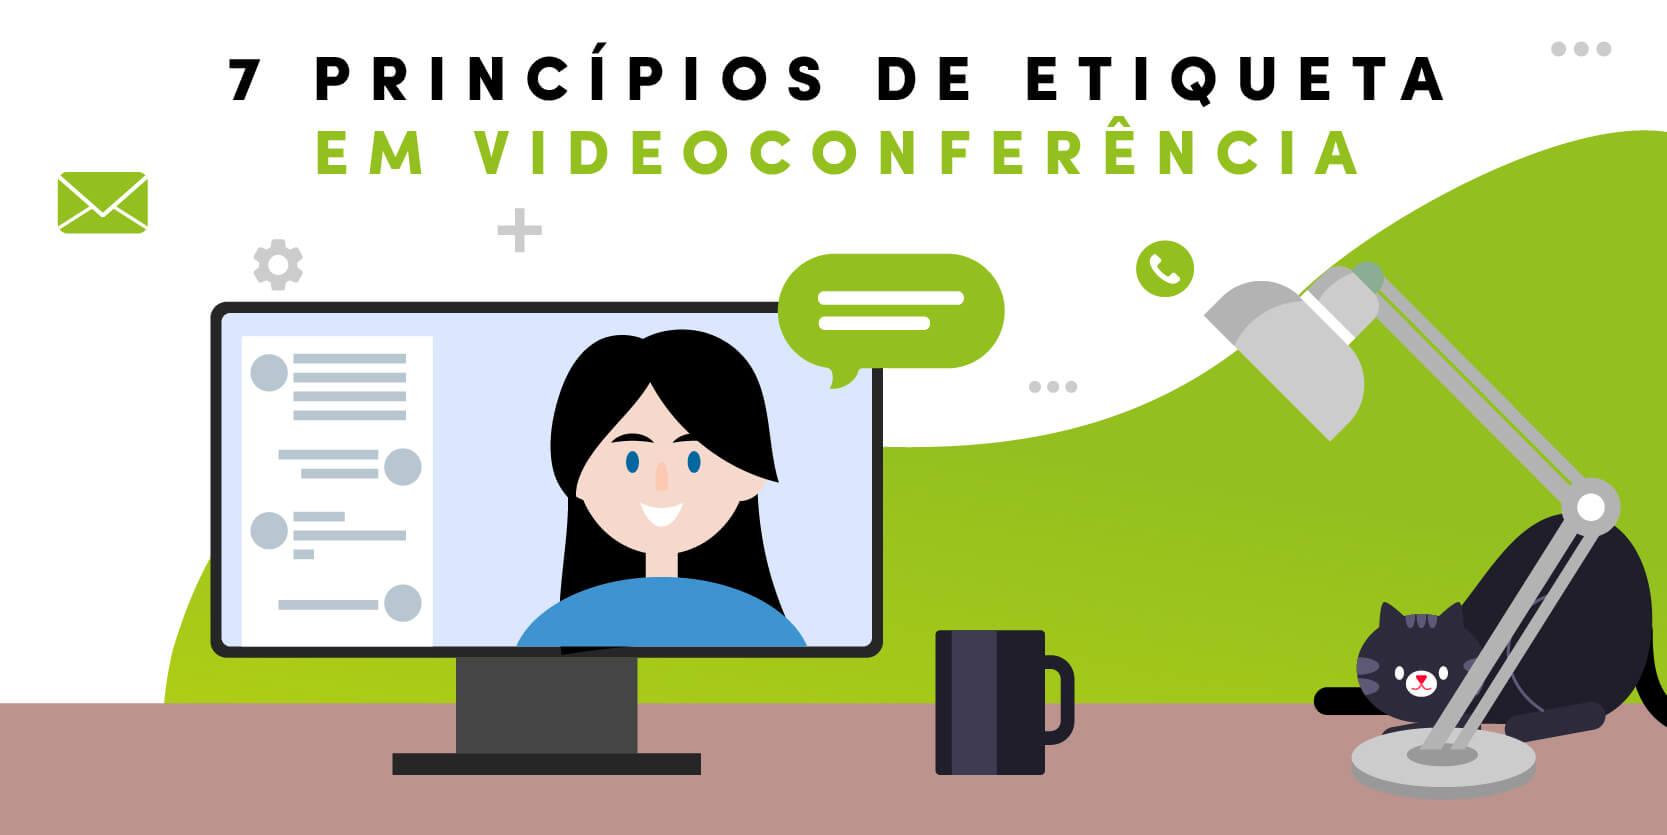 Infografia - 7 princípios de etiqueta em videoconferência - IT People Innovation